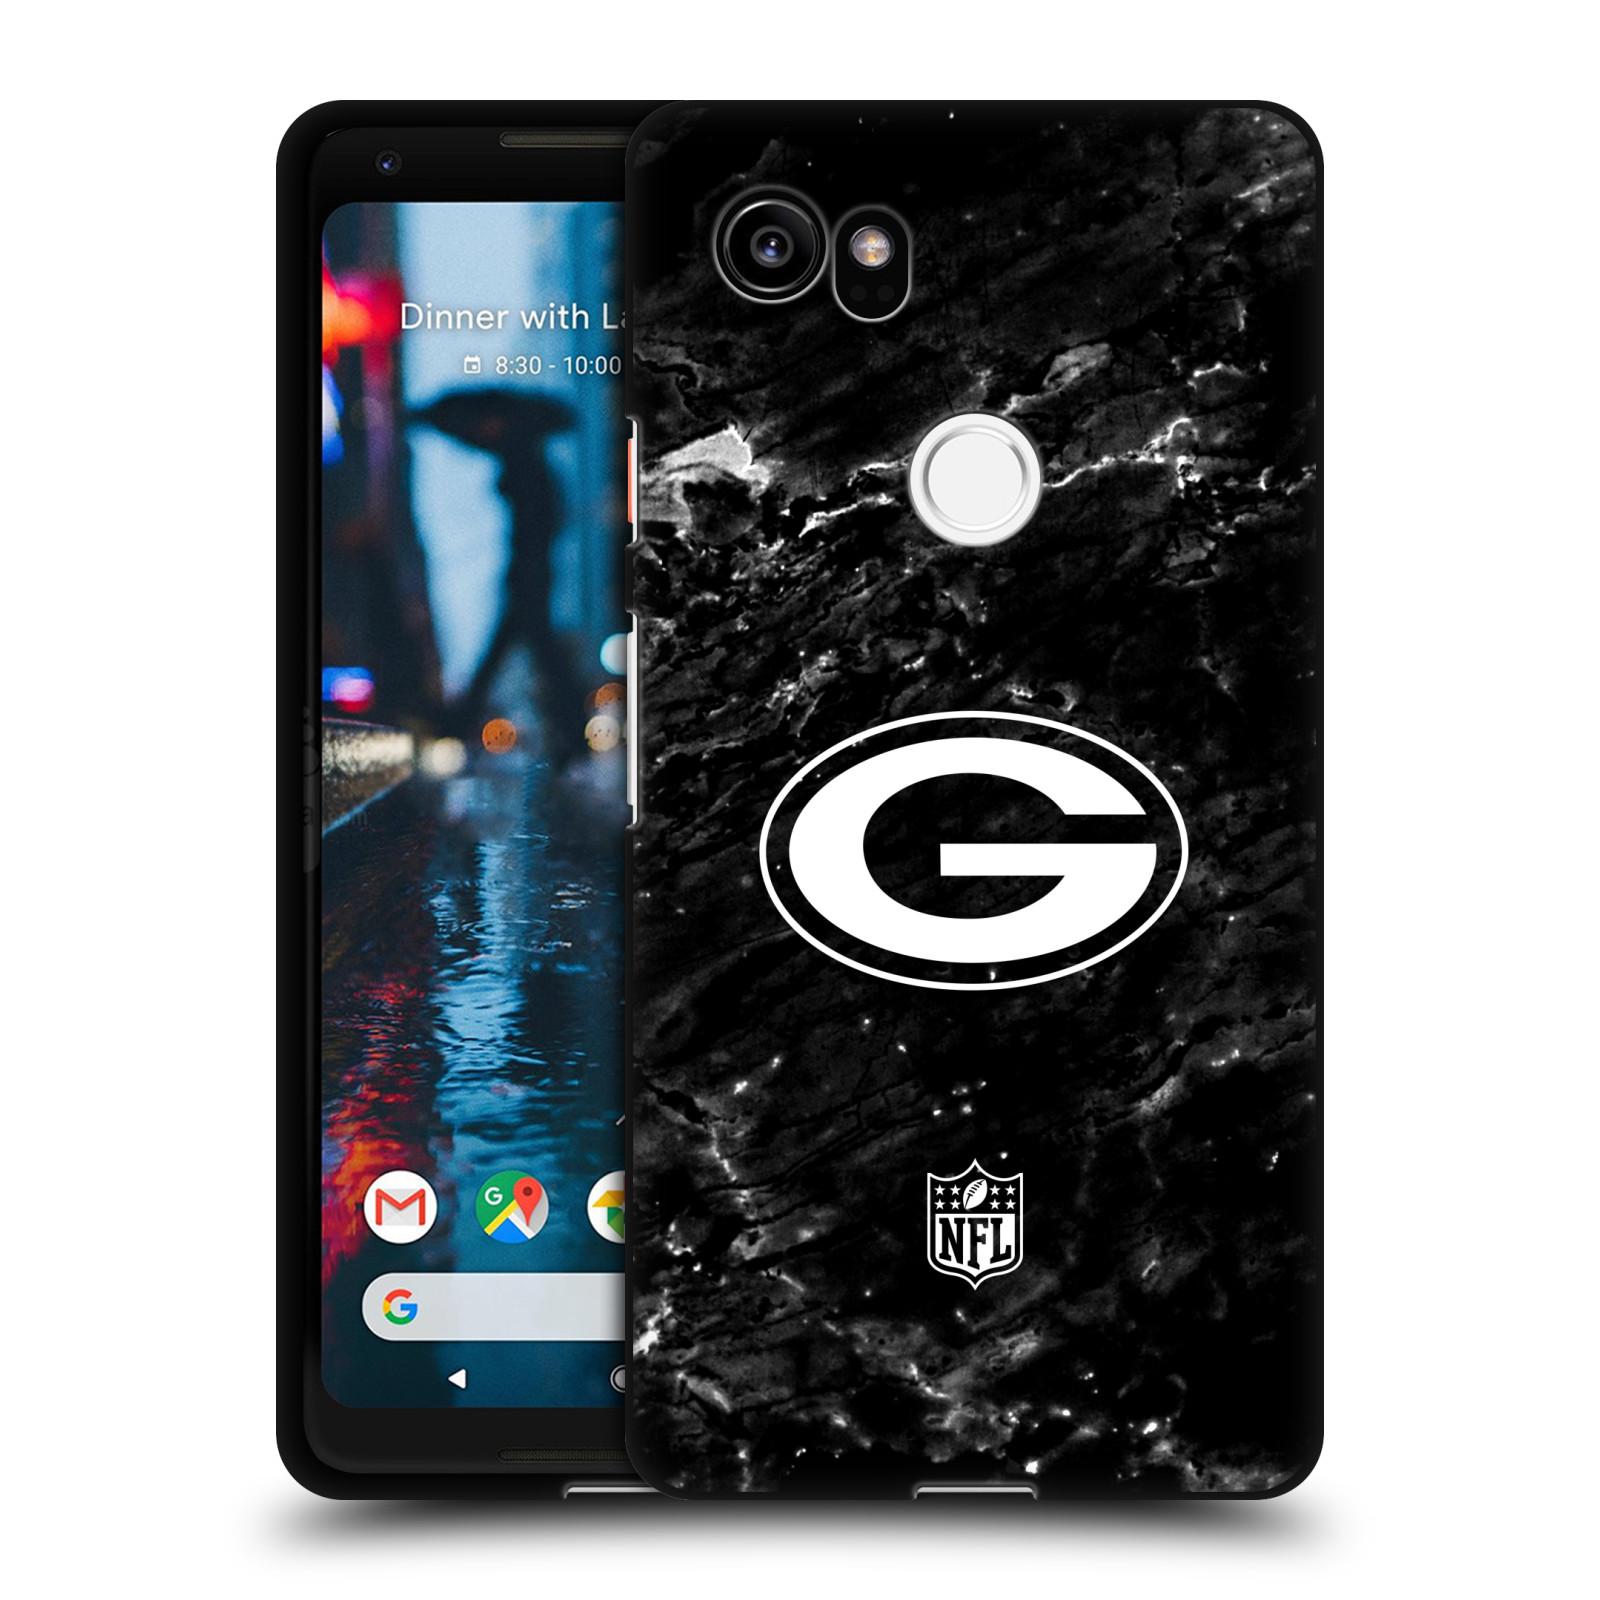 UFFICIALE-NFL-2017-18-GREEN-BAY-PACKERS-COVER-IN-GEL-NERA-PER-GOOGLE-TELEFONI